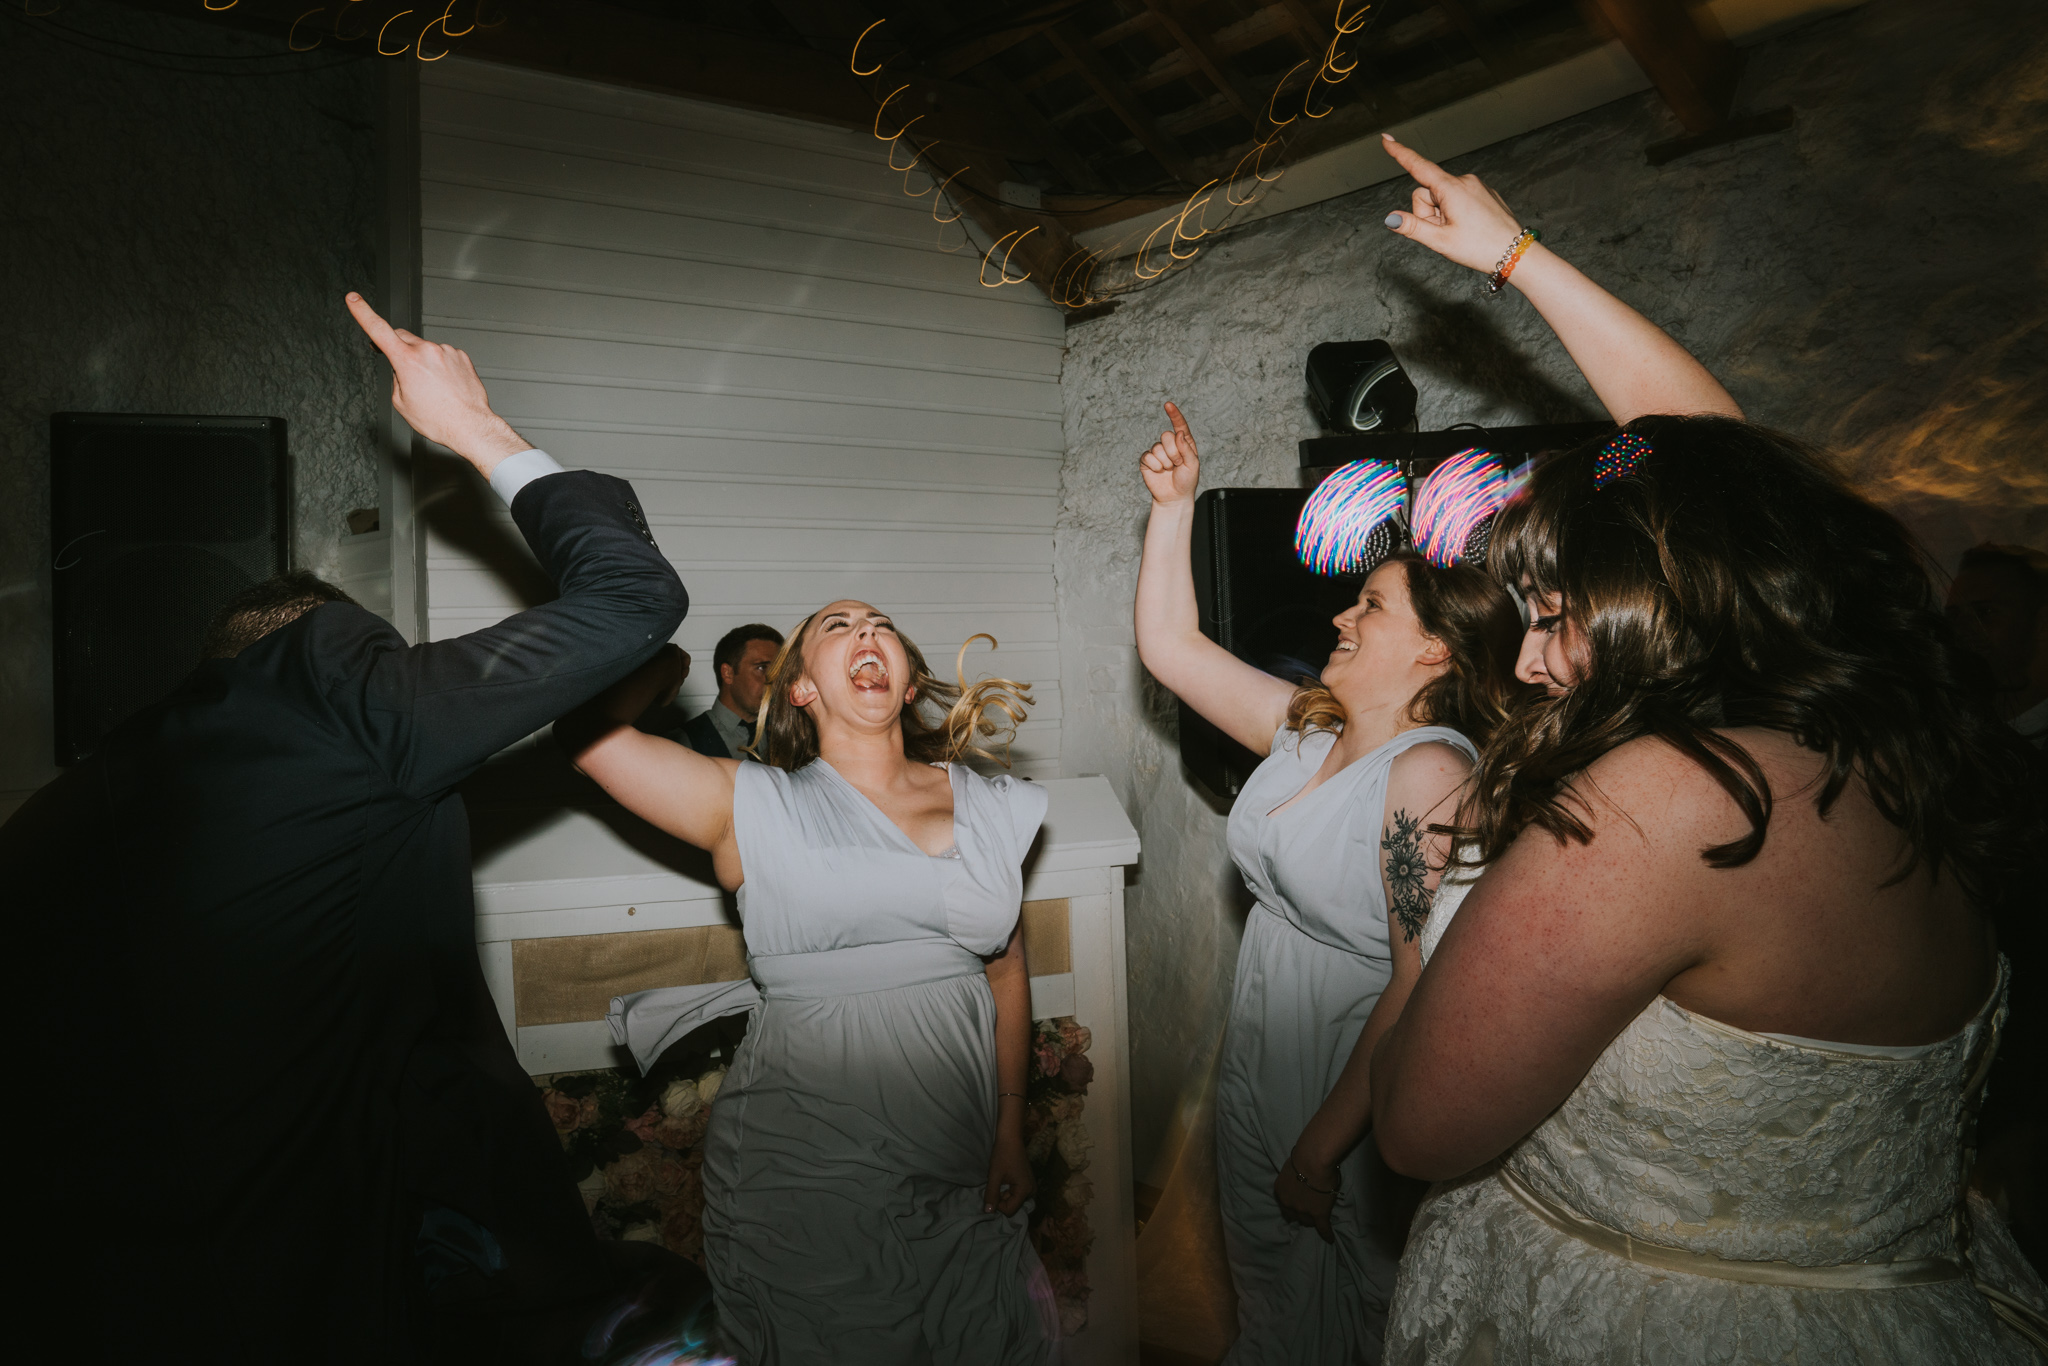 grace-sam-old-barn-clovelly-devon-wedding-photographer-grace-elizabeth-essex-suffolk-norfolk-wedding-photographer (125 of 132).jpg